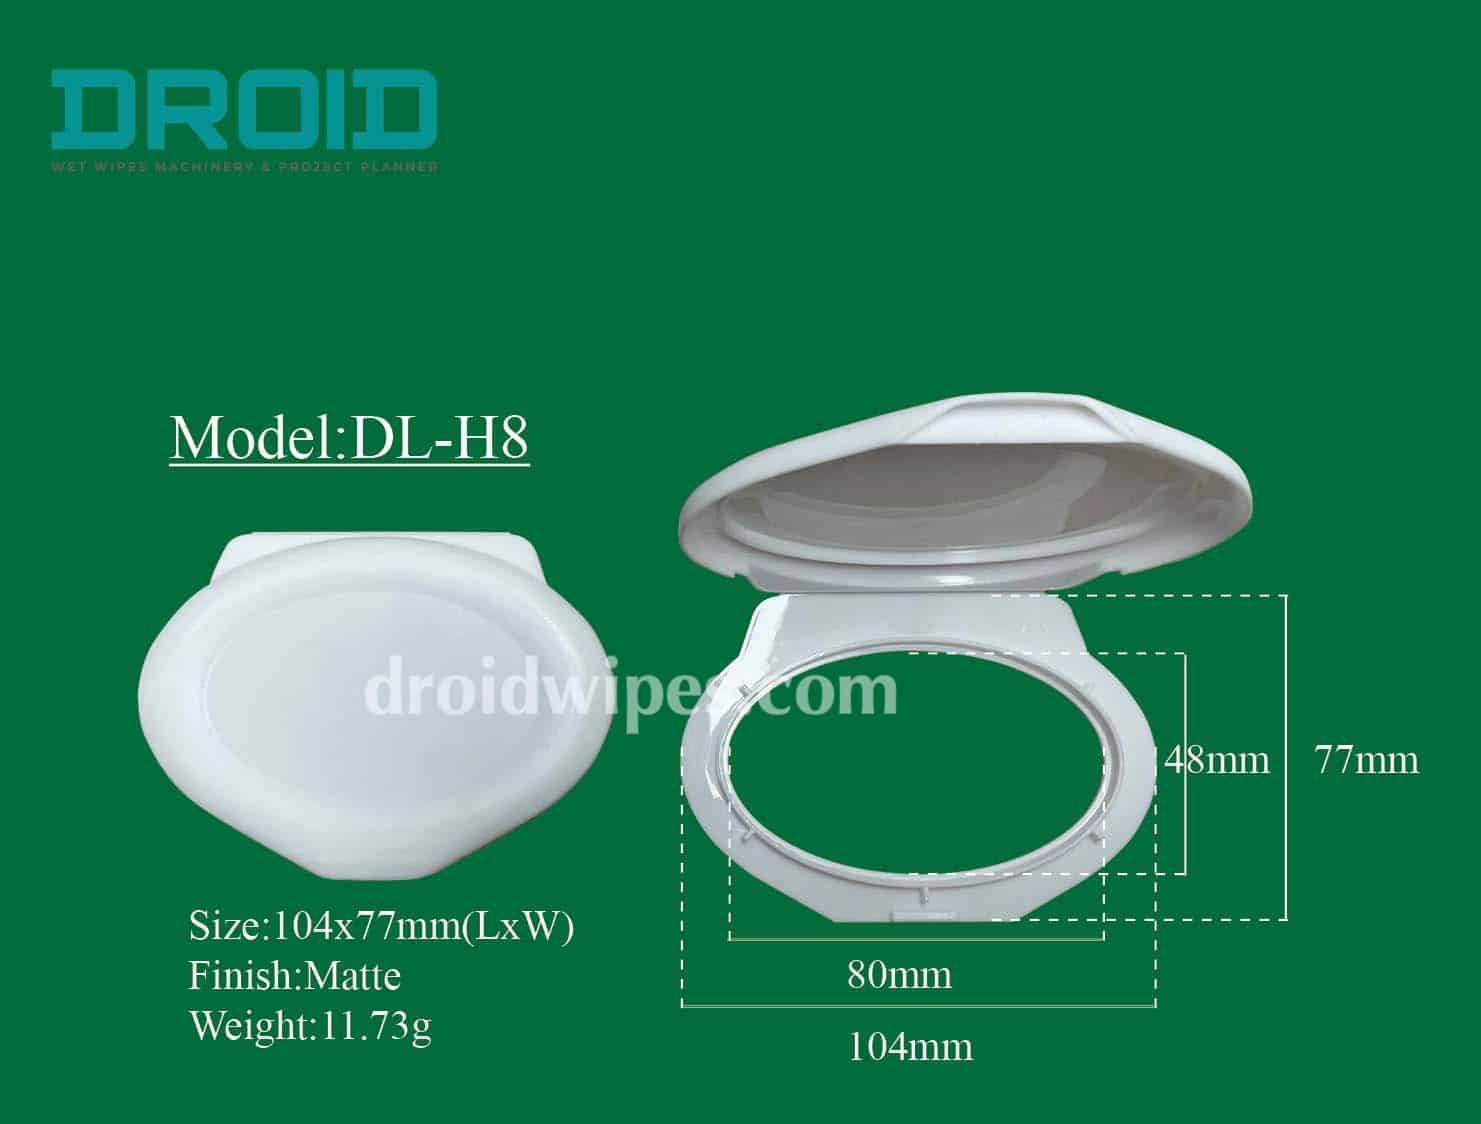 Plastic lid for wet wipes 7 - Plastic Lid for Wet Wipes